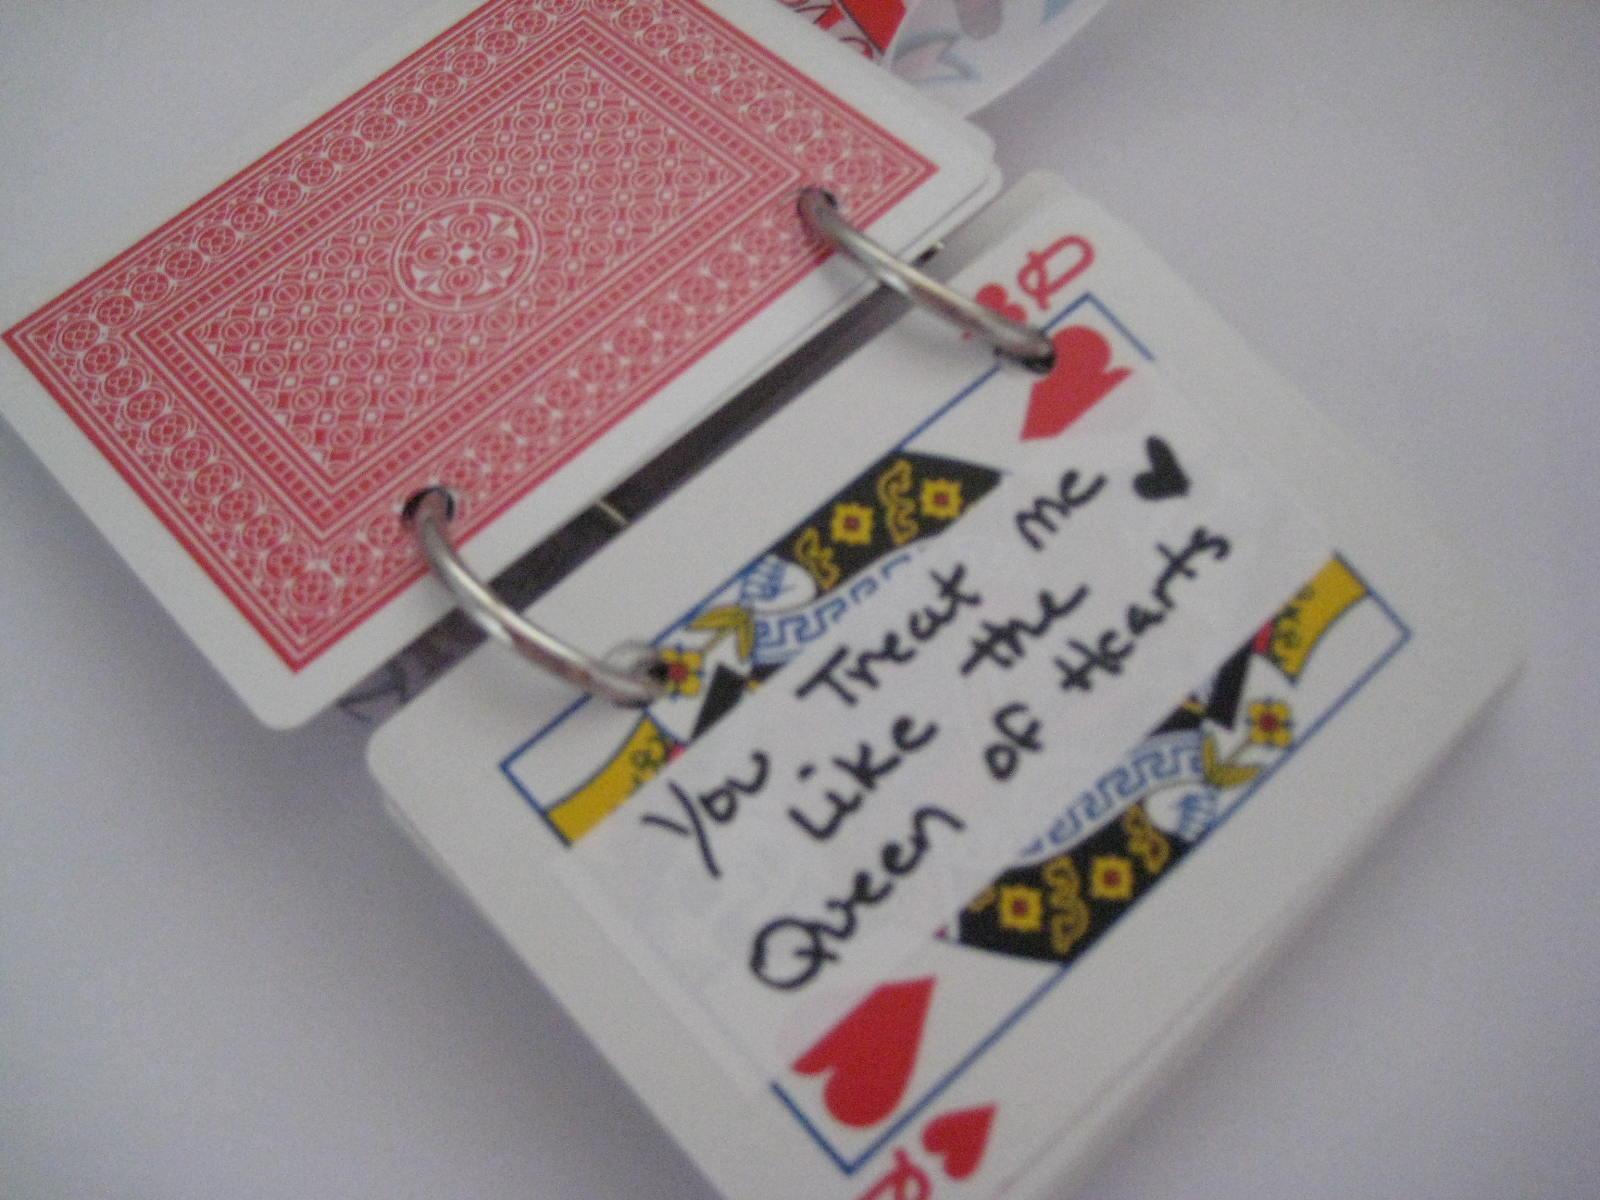 52 Reasons Why I Love You Cards Ideas | www.imgkid.com ...